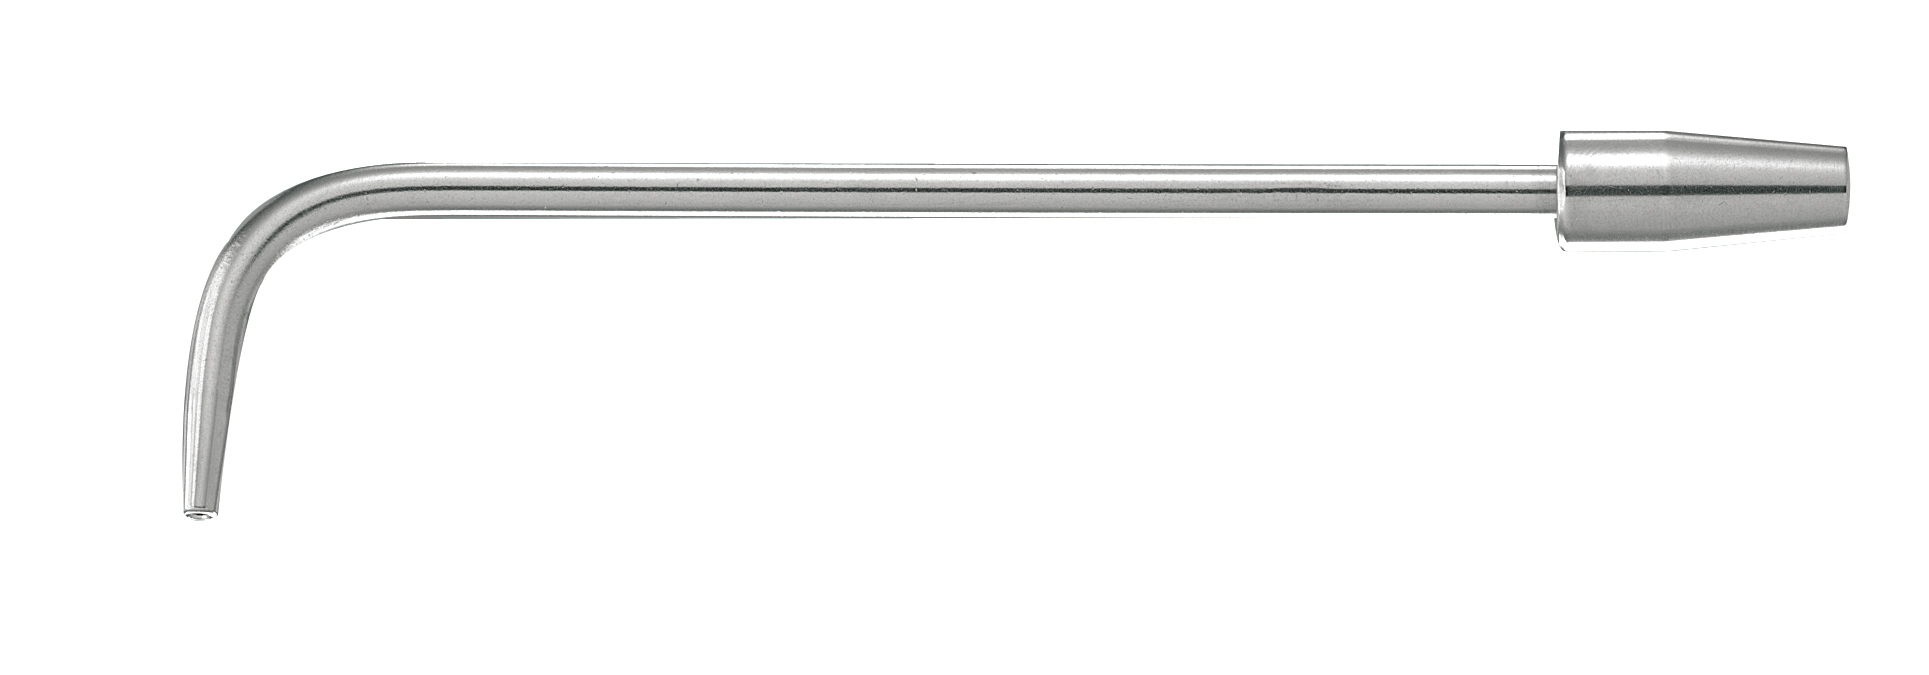 aspirator-tip-6-013-31006-miltex.jpg